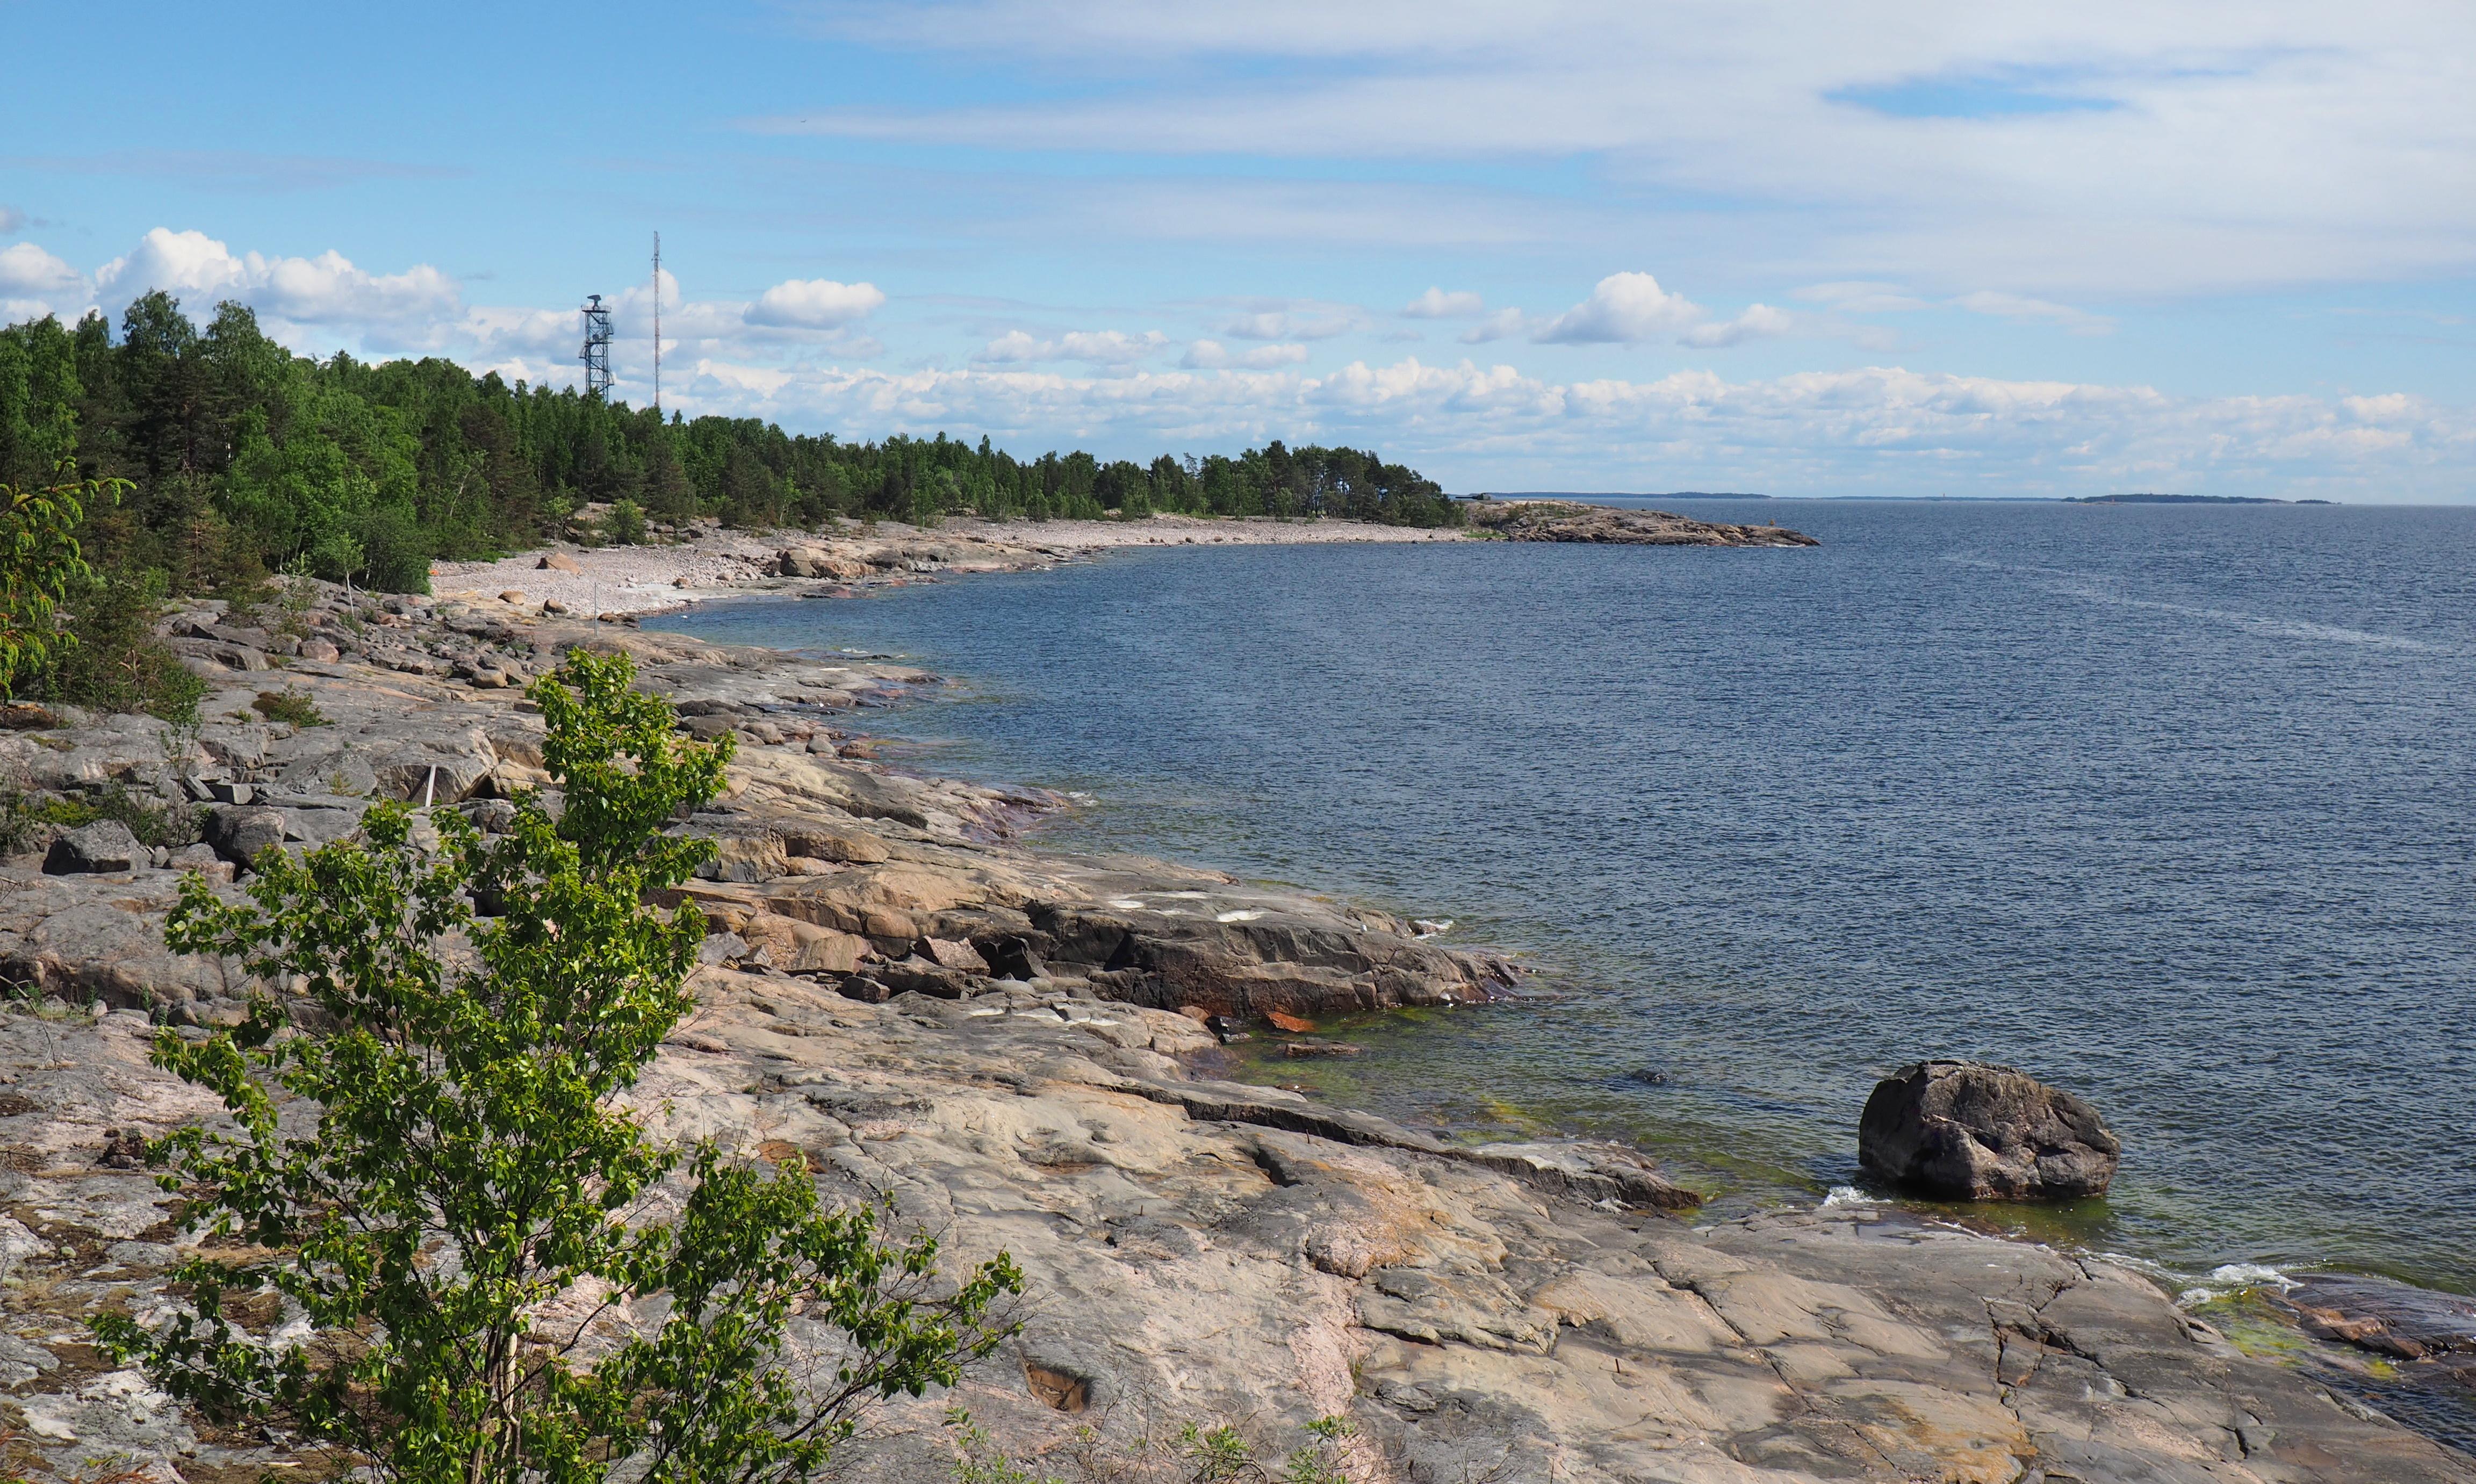 Isosaari island - Marit Henriksson.jpg